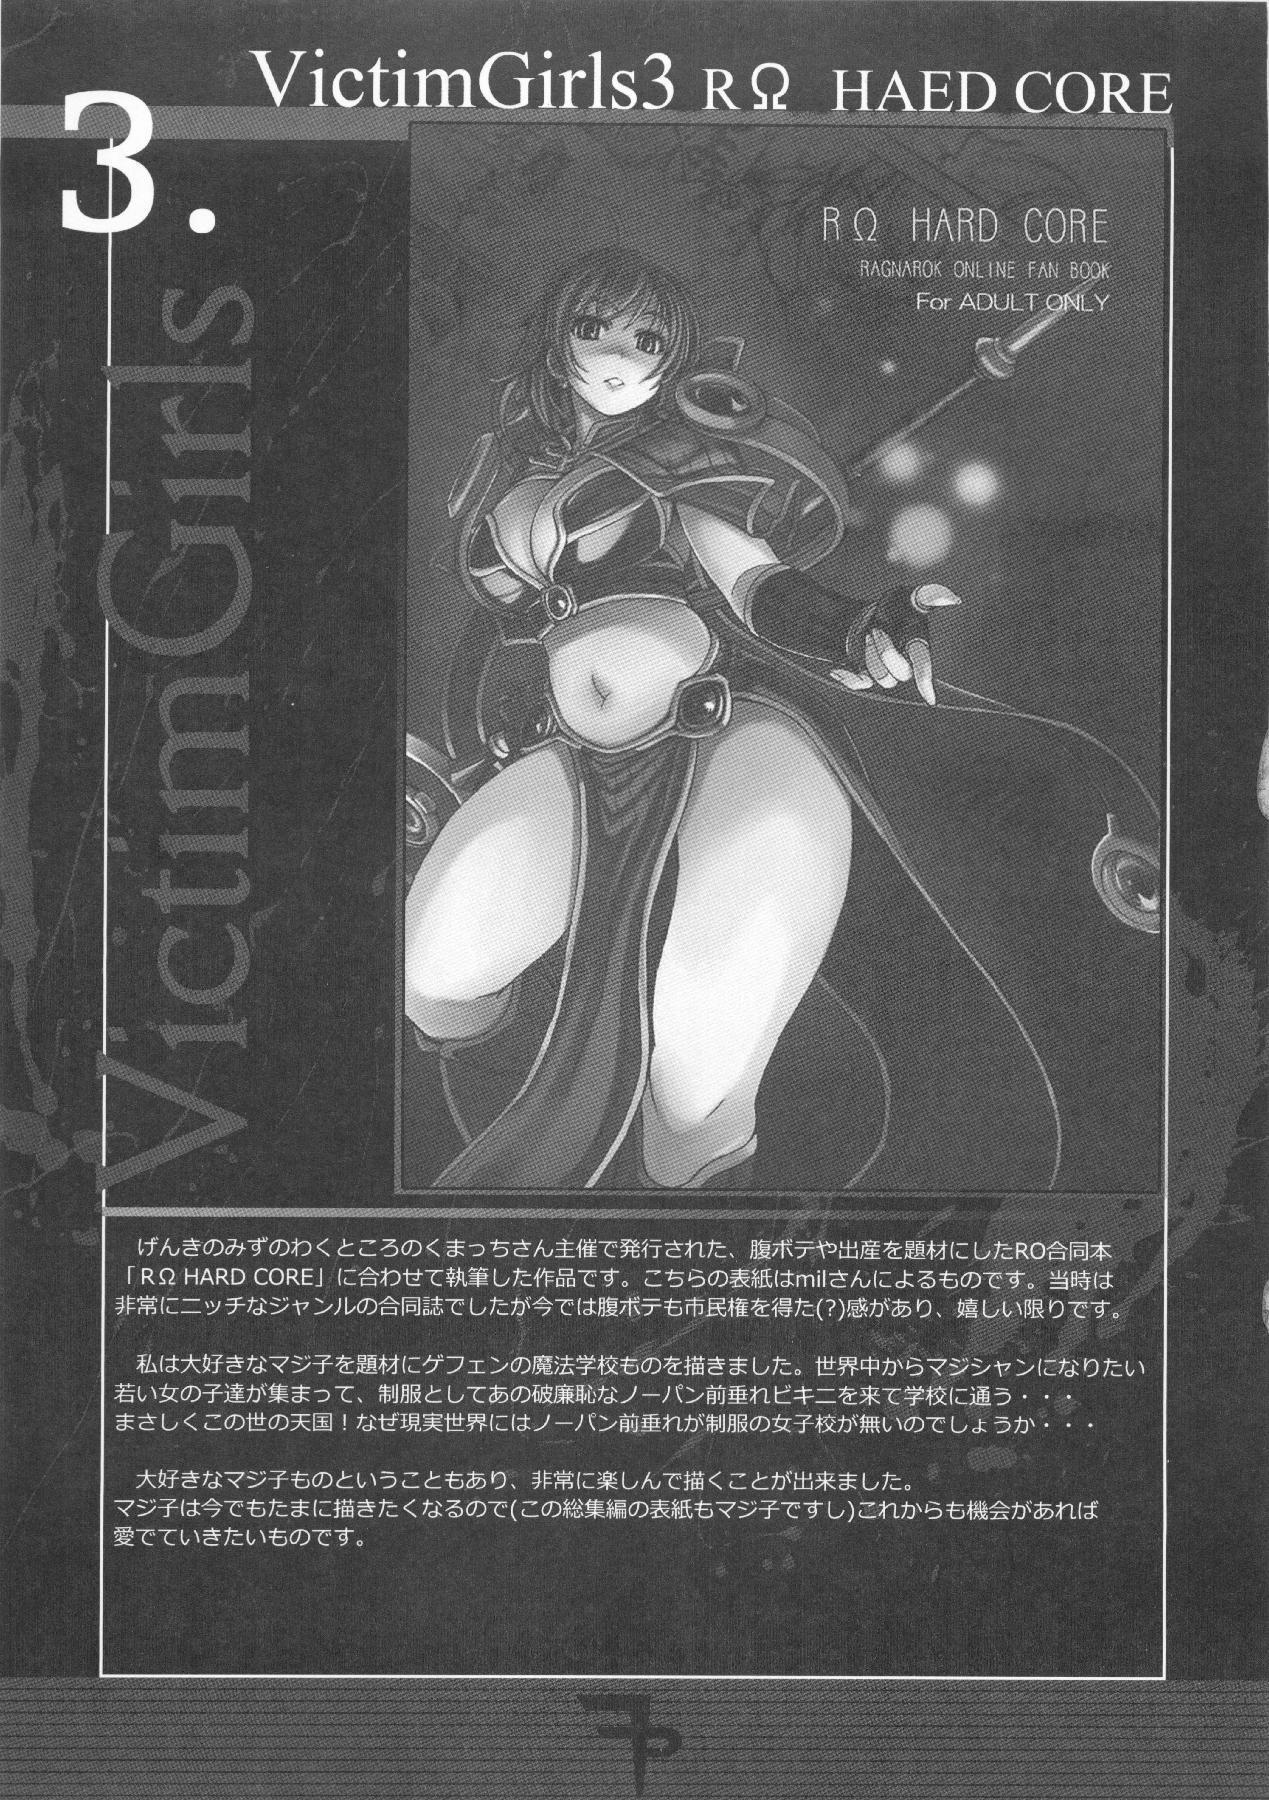 (C83) [Fatalpulse (Asanagi)] VictimGirls Compiled Vol.1 -Victimgirls Soushuuhen 1- MMO Game Selection (Various) 71